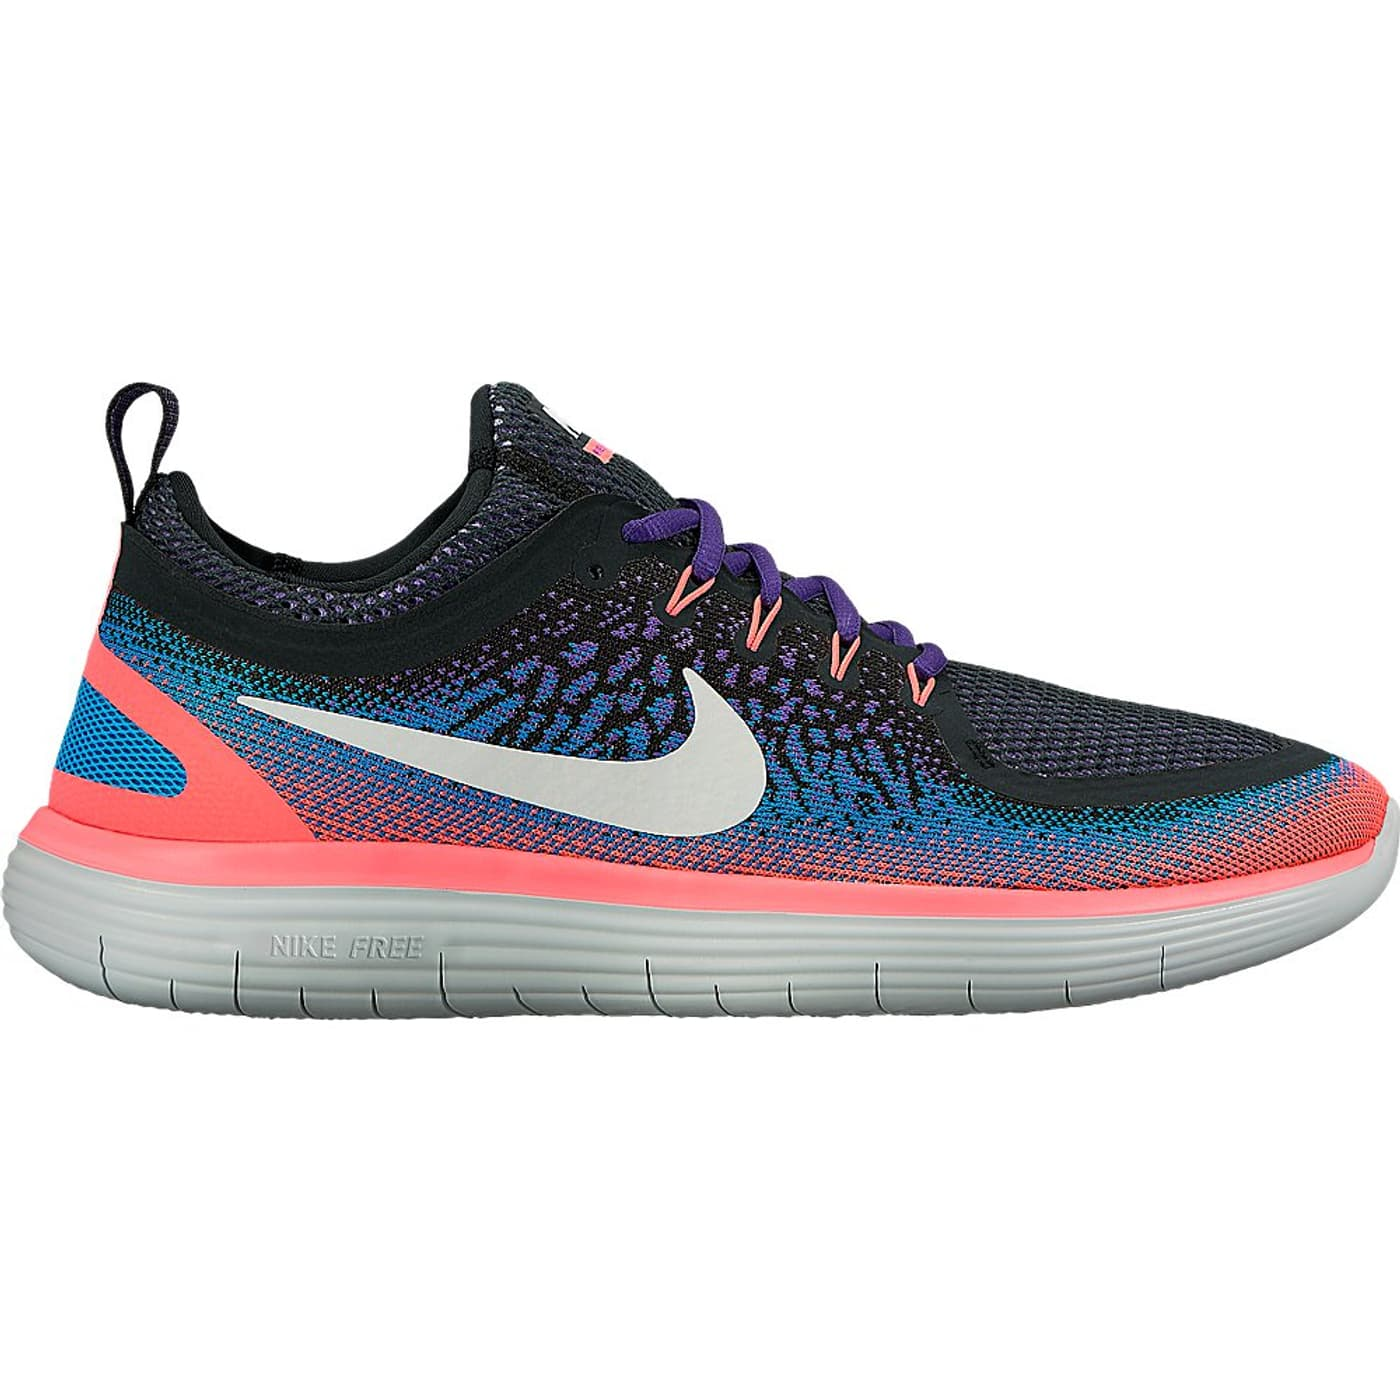 Nike Free Run Distance 2 Herren-Runningschuh | Migros